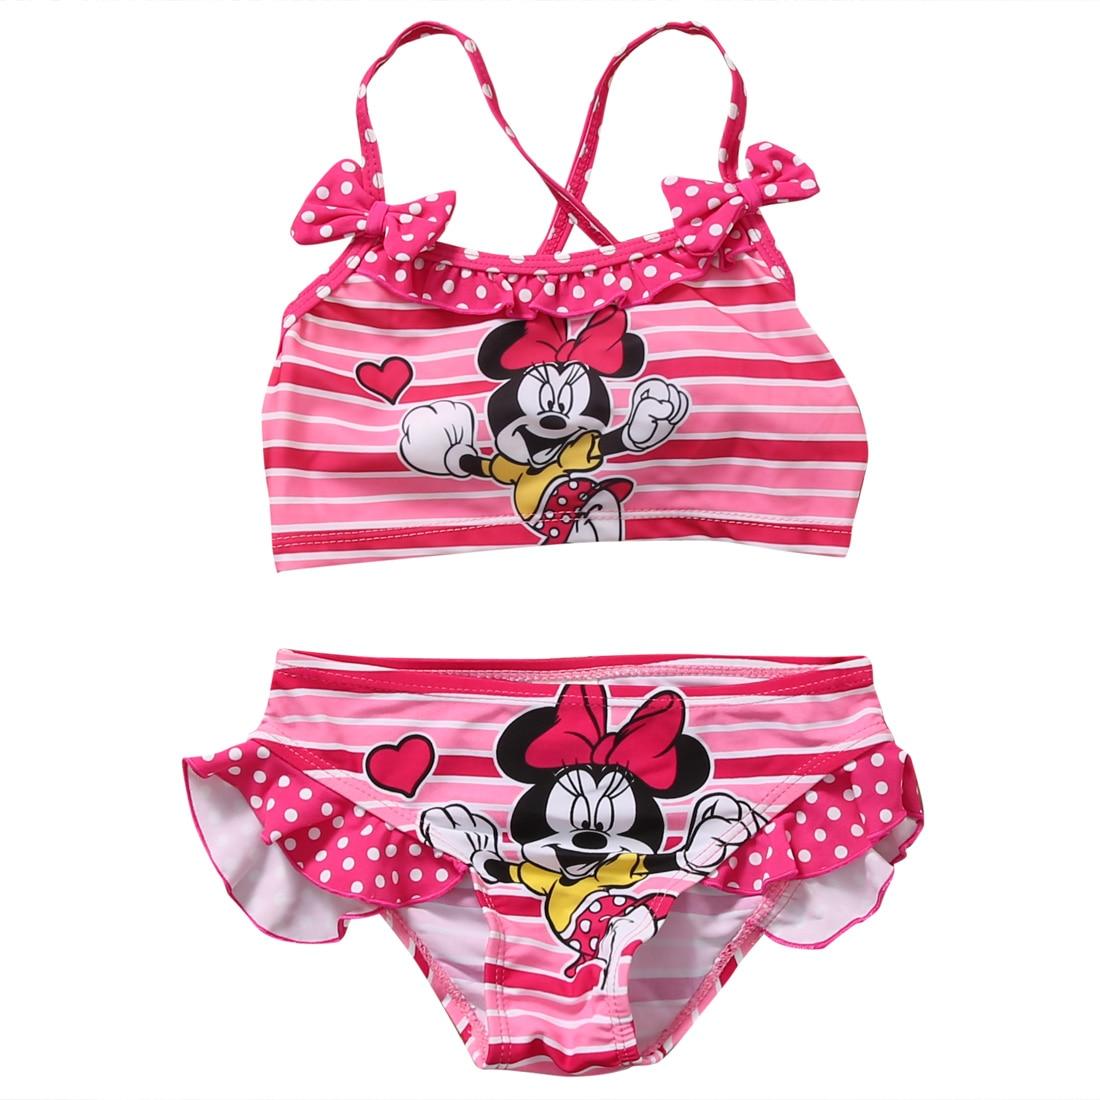 f52ed75845 2019 Cartoon Kids Girl Swimwear Bikini Set Cute Bowknot Beachwear Character Bathing  Suit Swimsuit 2-